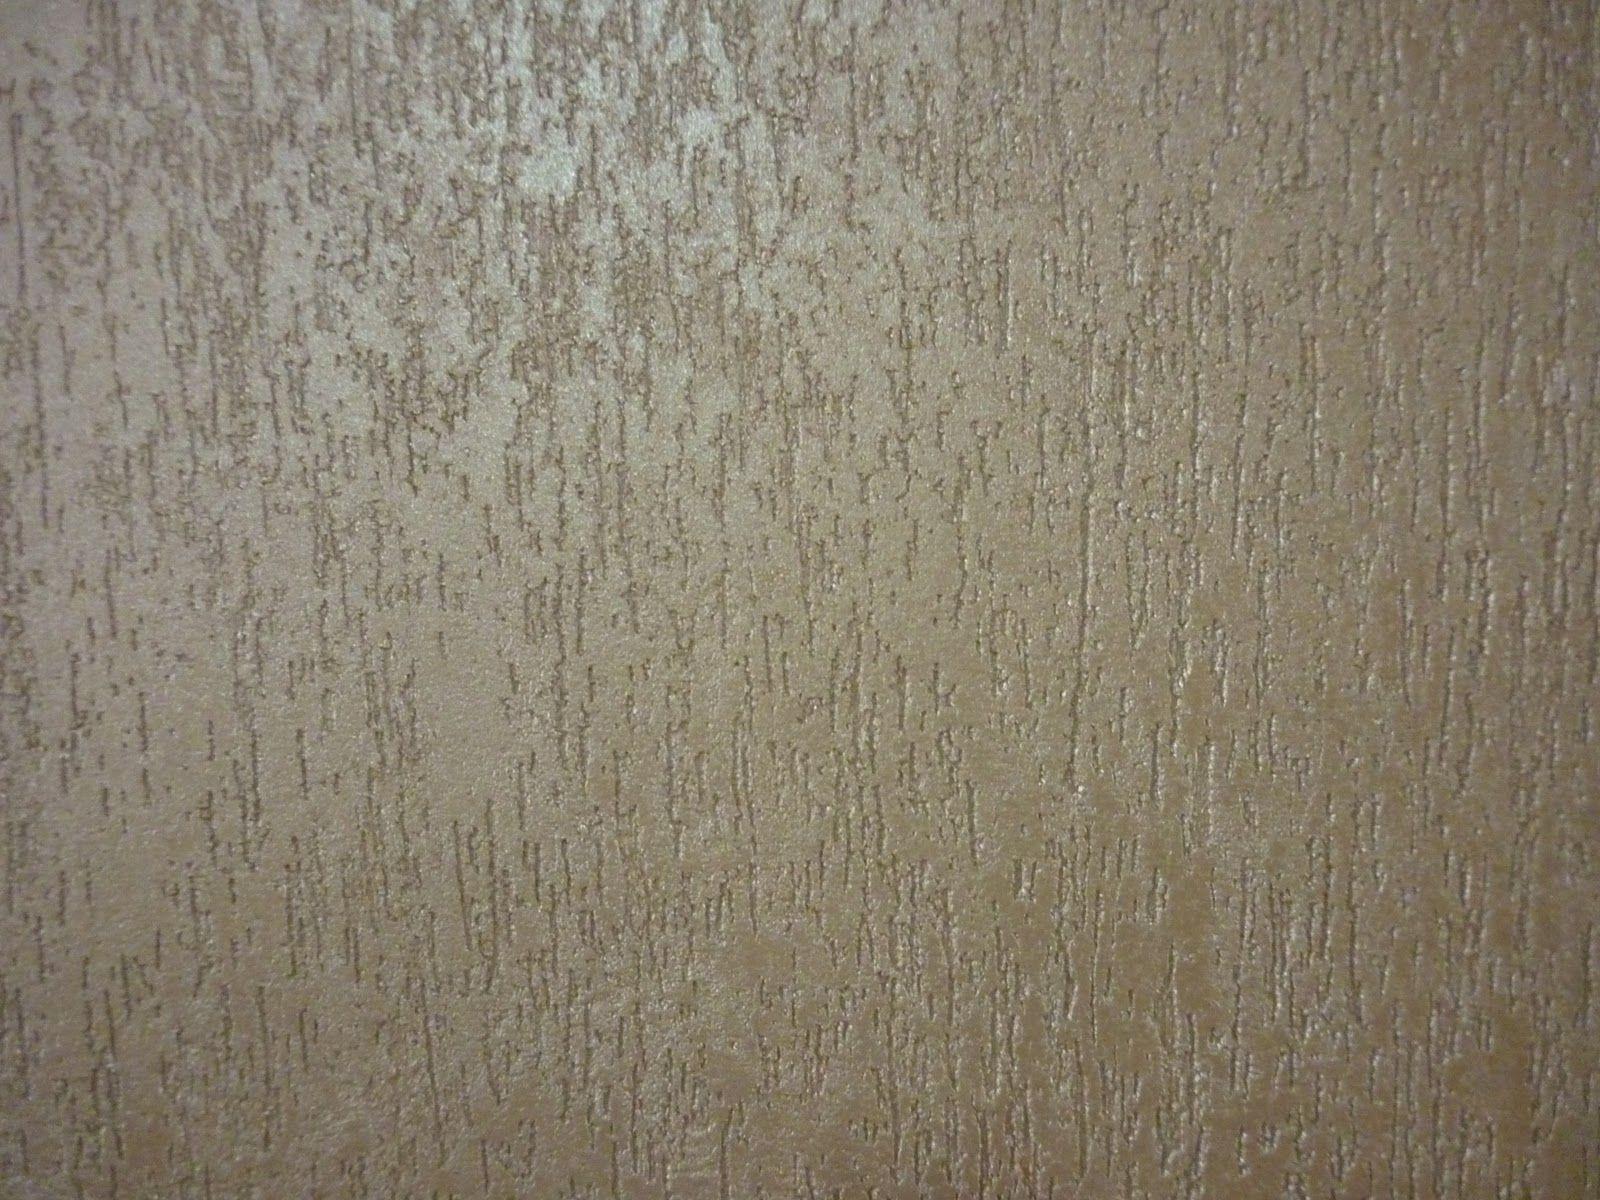 Texturas en paredes rusticas esc pinturas rio grande - Pinturas en paredes ...